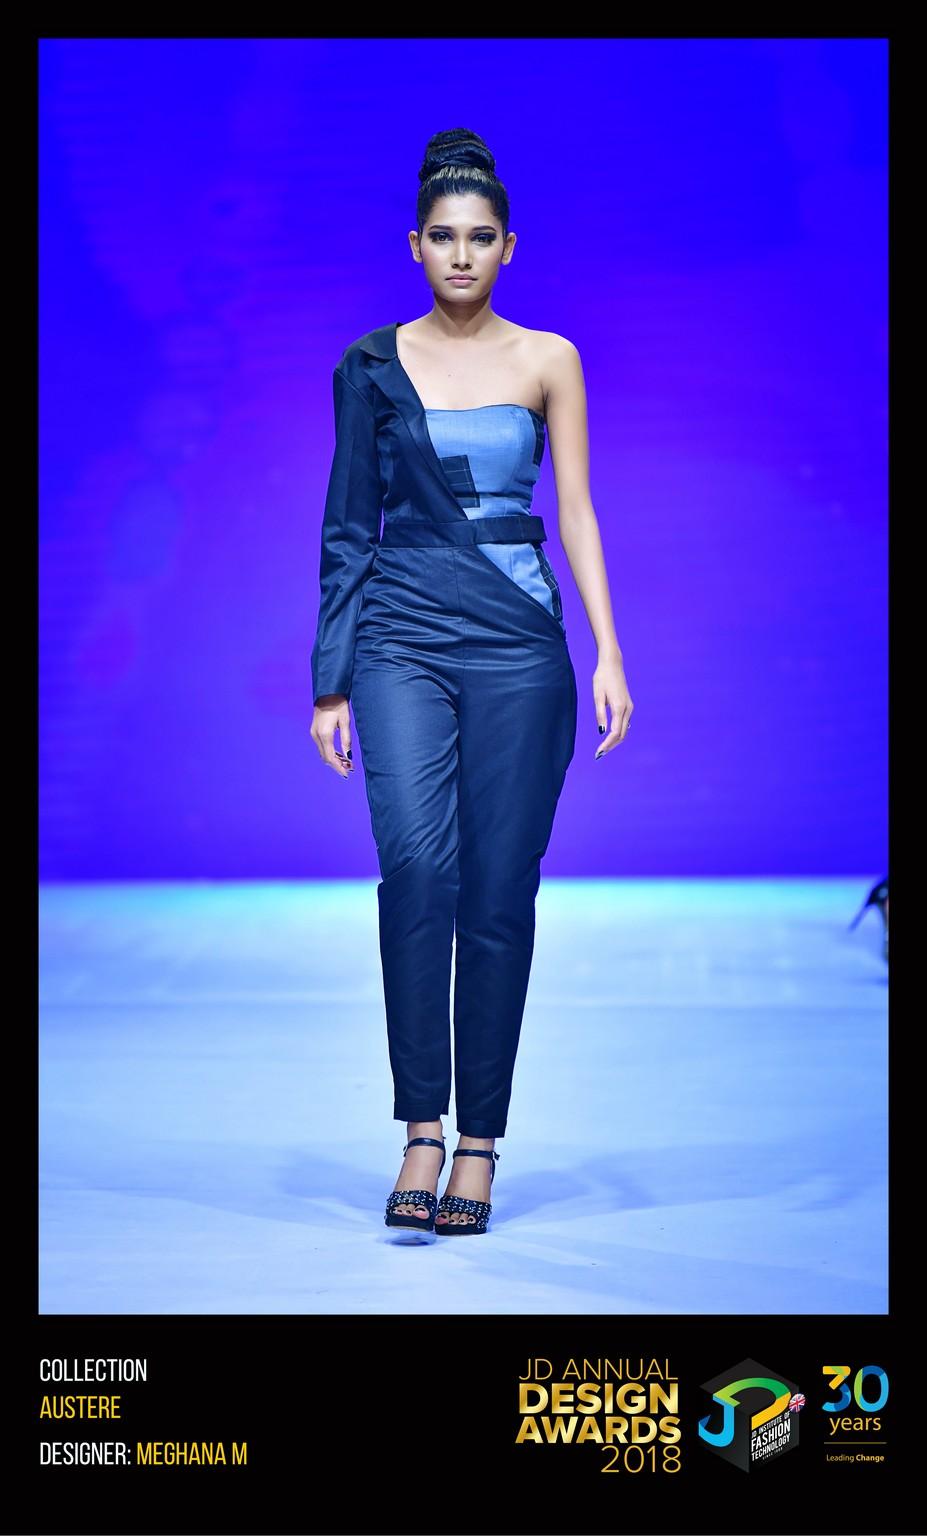 Austere – Change – JD Annual Design Awards 2018 | Designer: Meghana | Photography : Jerin Nath (@jerin_nath) austere - AUSTERE6 - Austere – Change – JD Annual Design Awards 2018